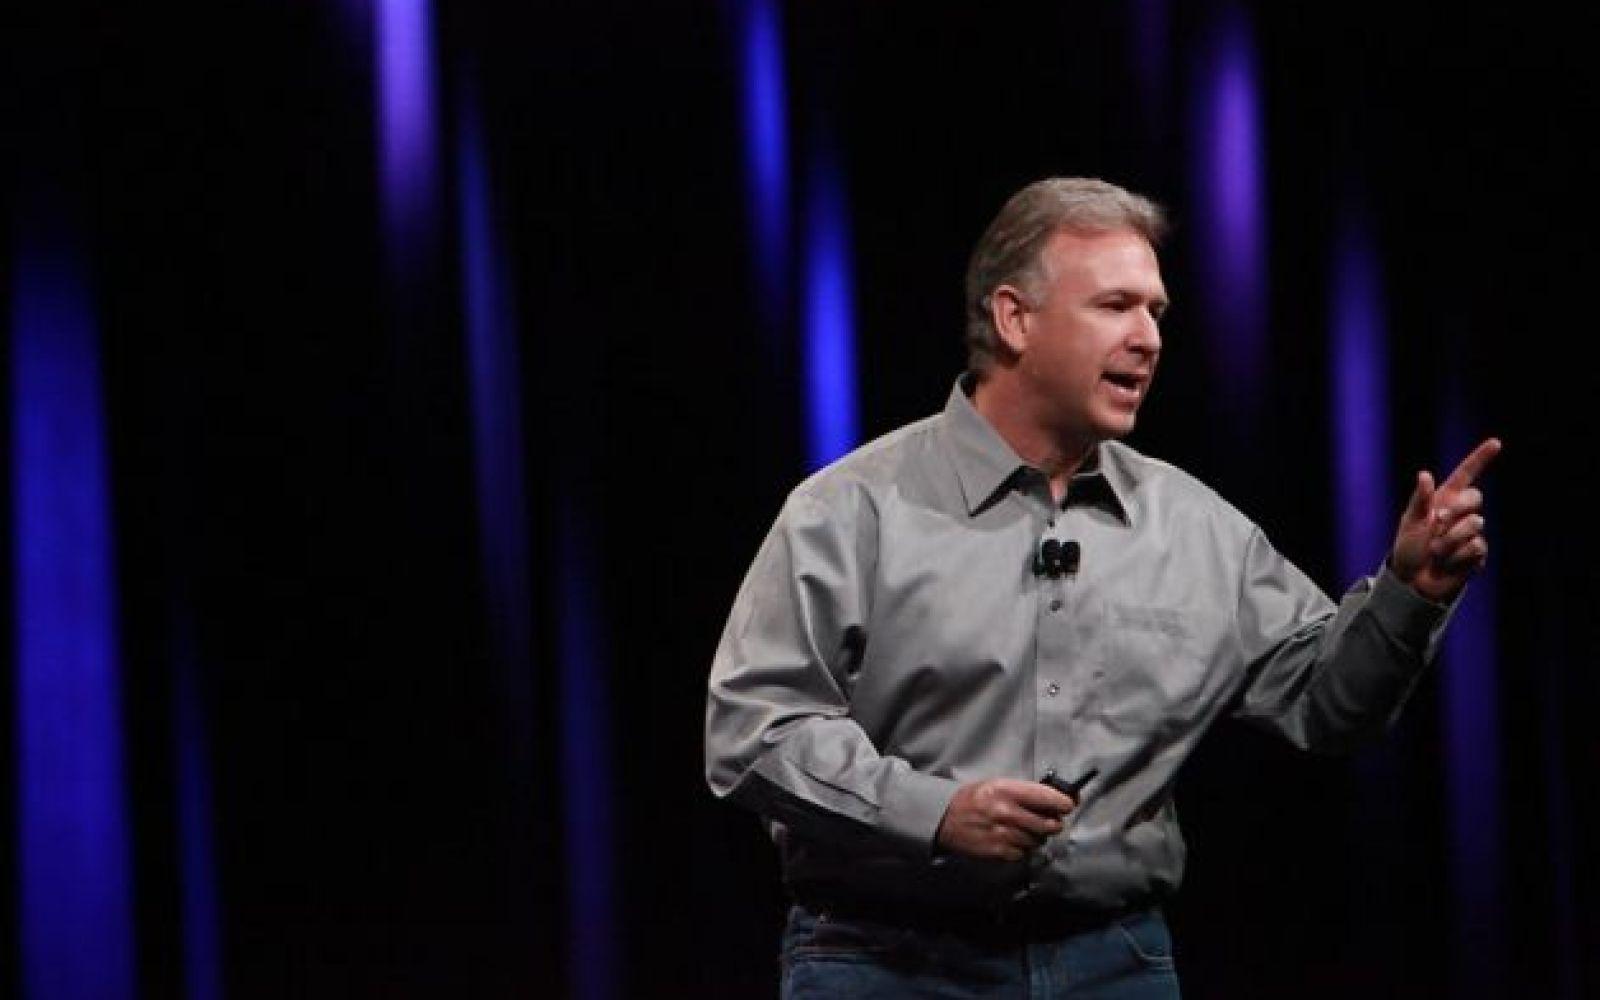 Apple Marketing SVP Phil Schiller calls out Samsung's Note 3 benchmarking 'shenanigans'